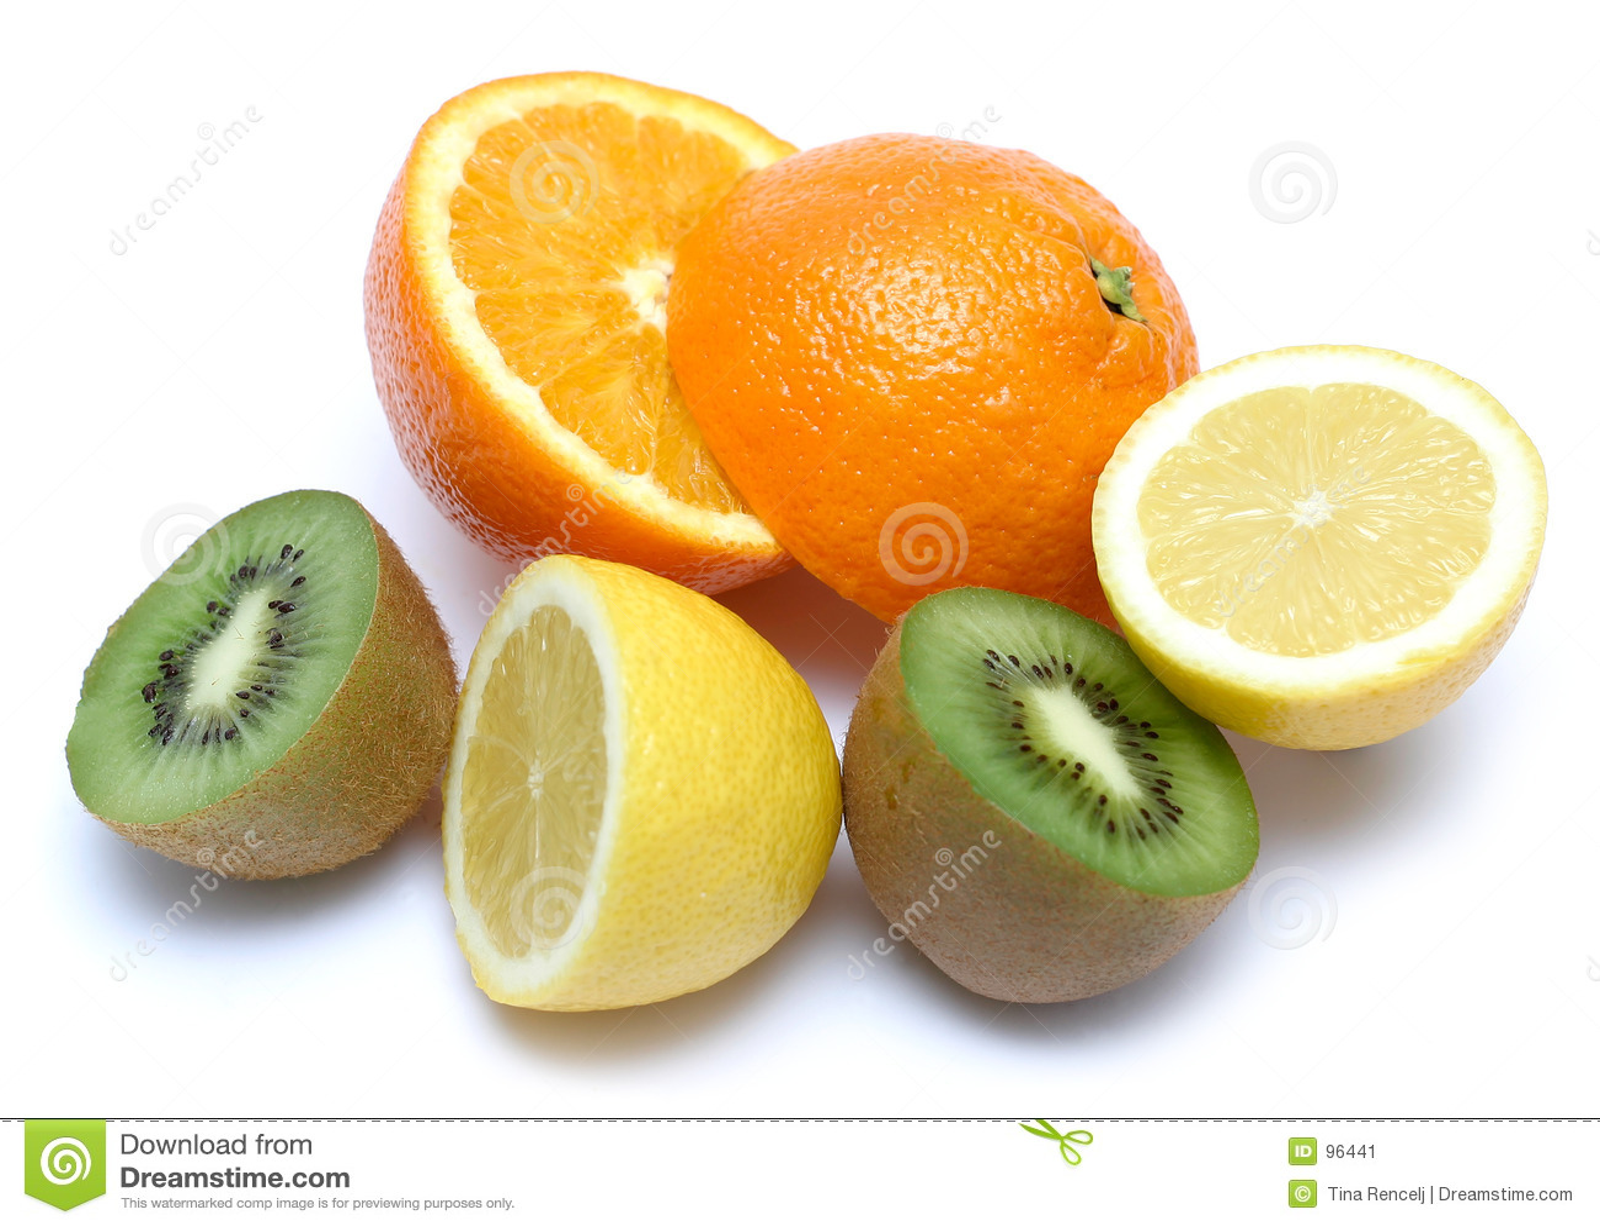 Surcharge de vitamine C